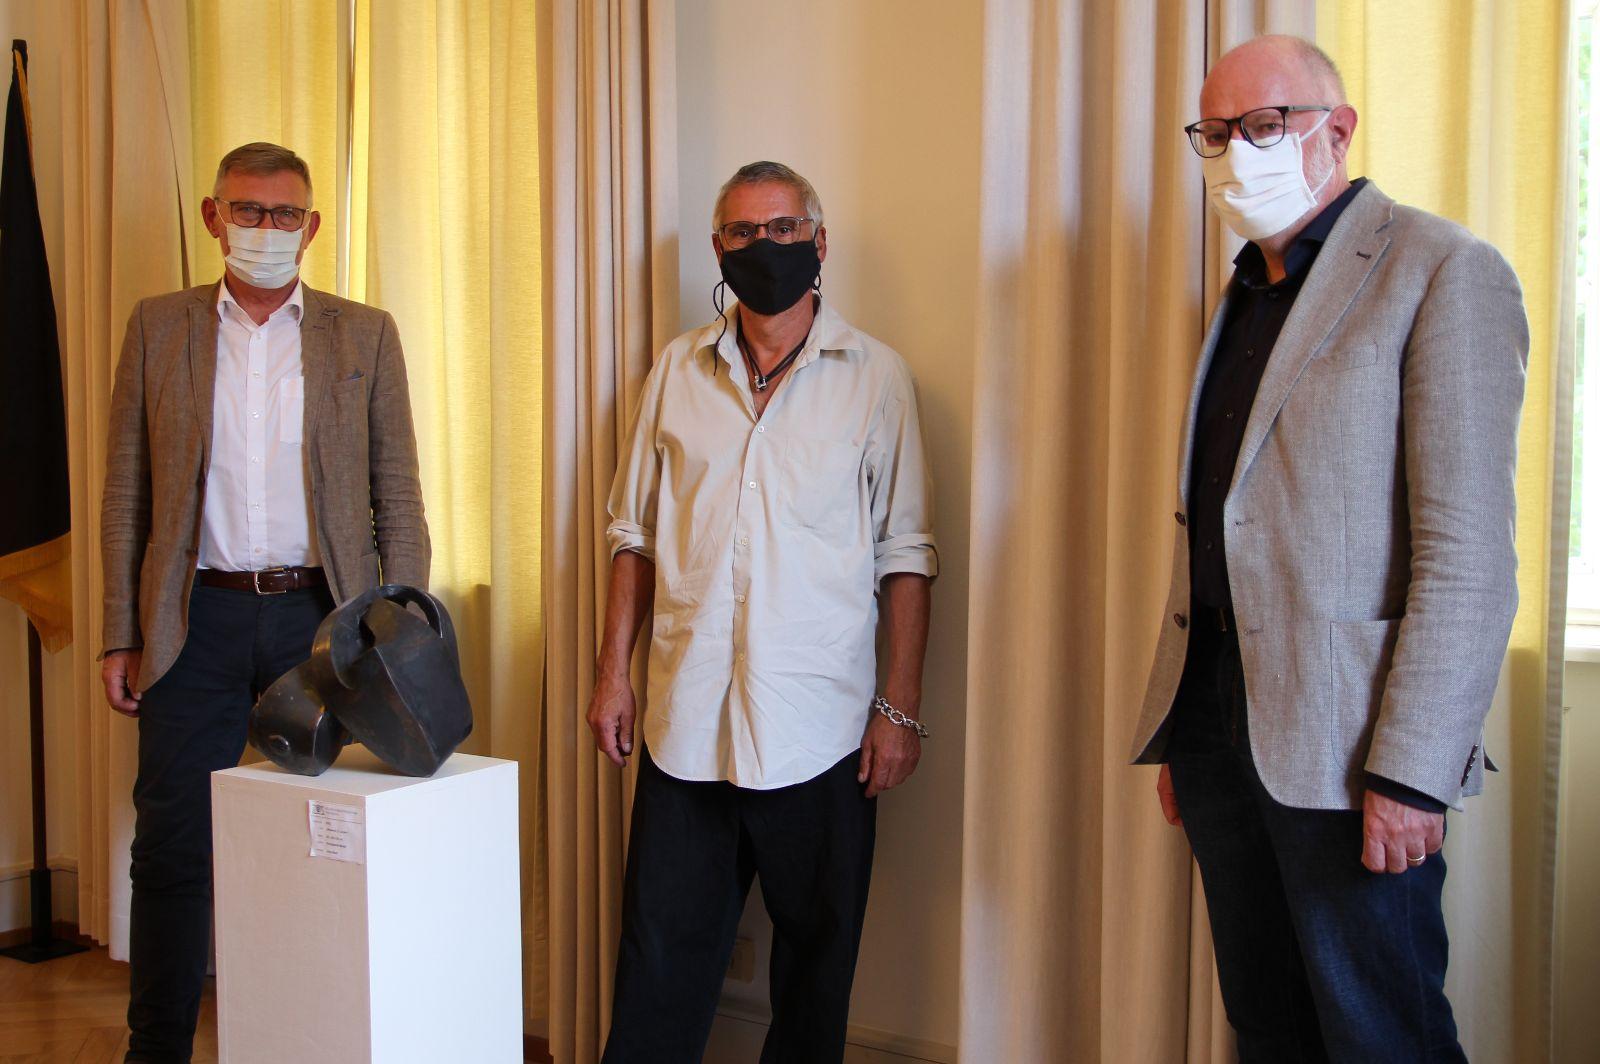 OB Michael Beck, Jörg Bach und Regierungsvizepräsident Klemens Ficht stehen hinter der Skulptur